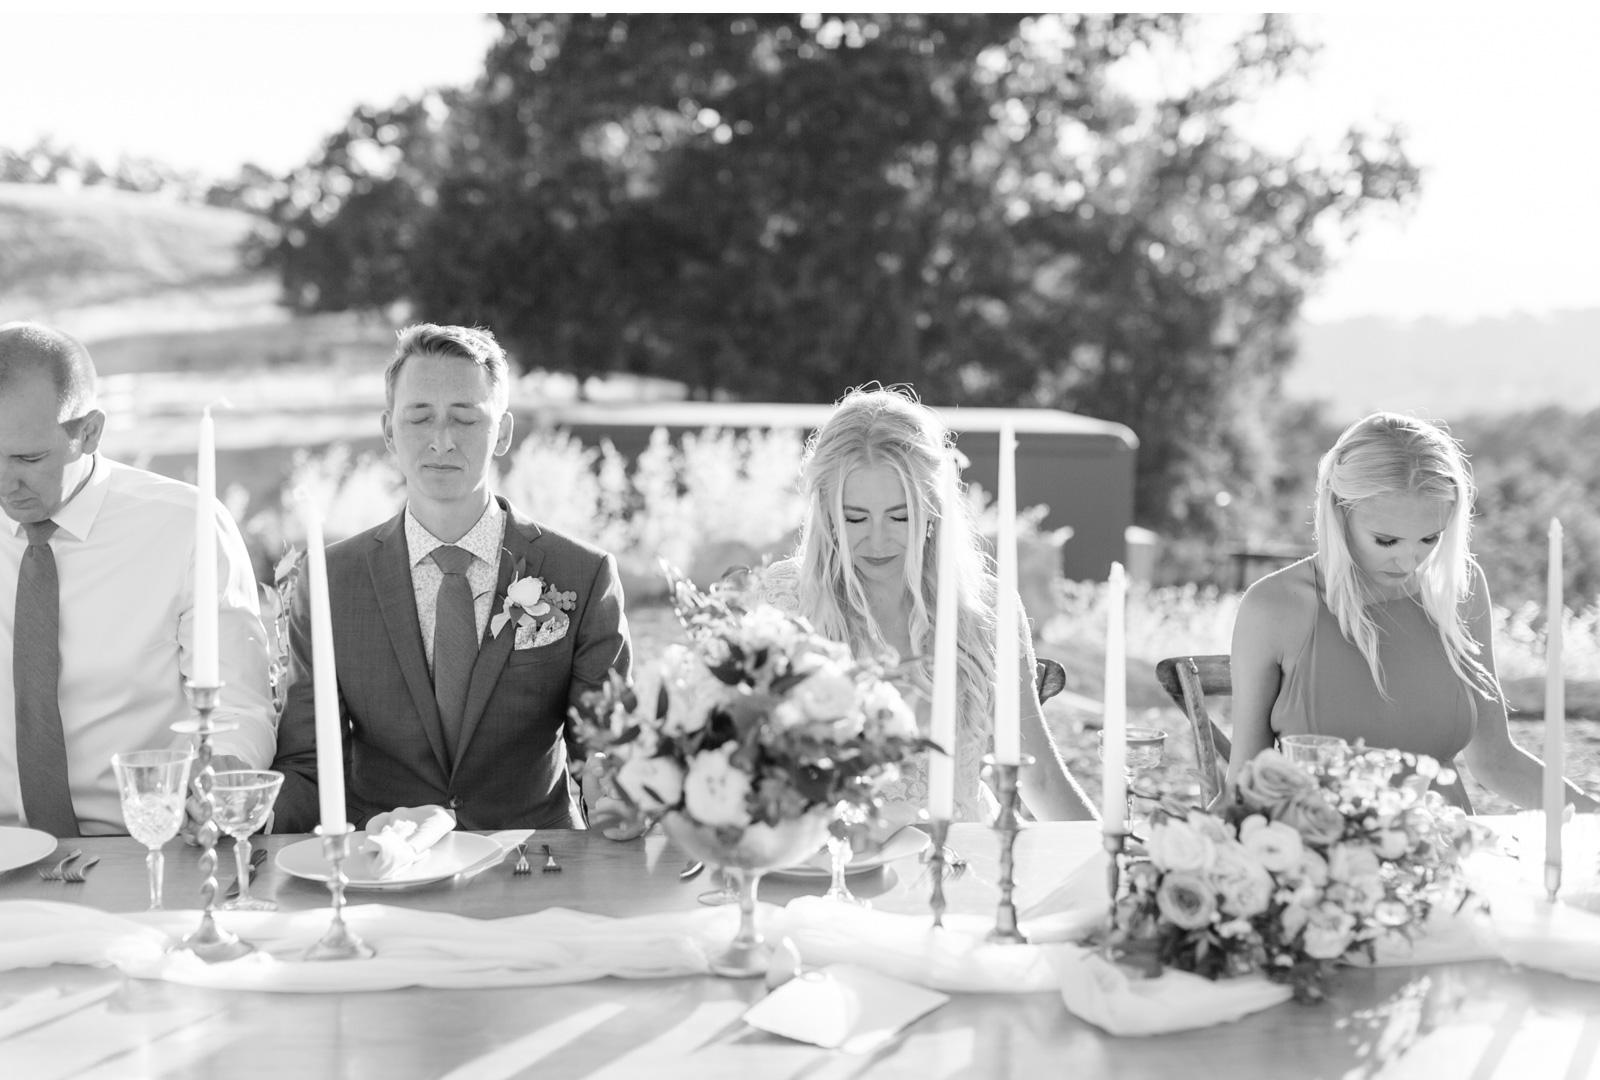 Natalie-Schutt-Photography's-Wedding-Style-Me-Pretty-Paso-Robles_10.jpg